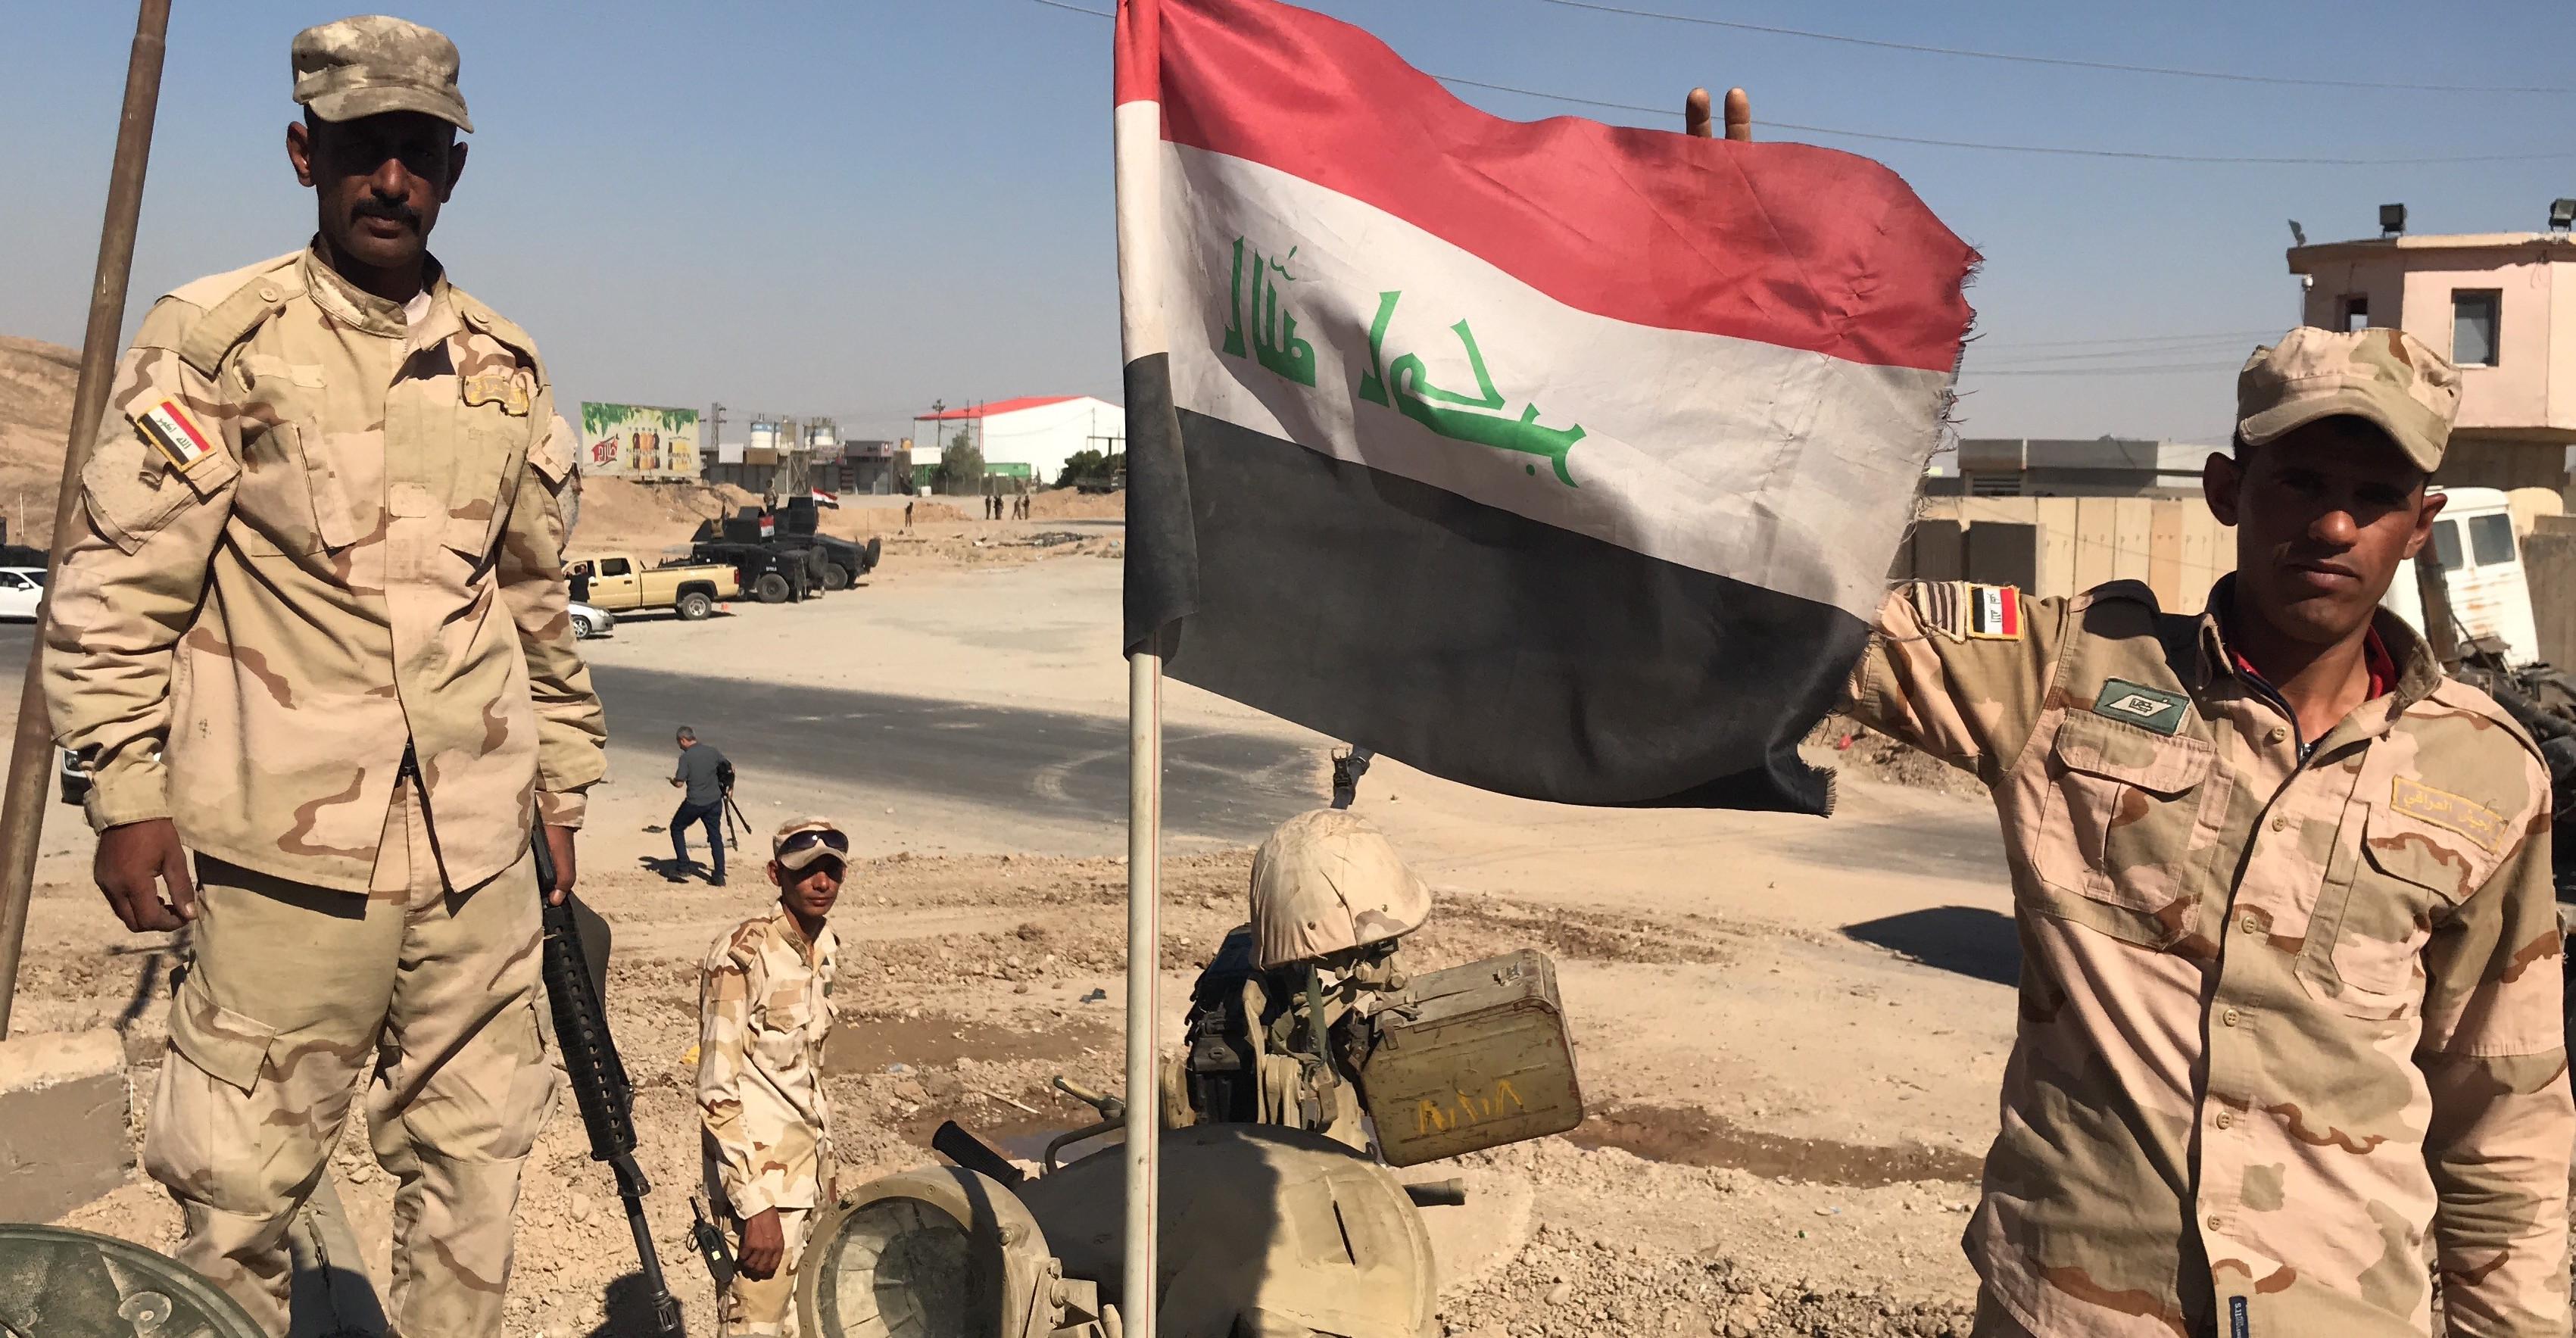 Iraqi soldiers in Kirkuk, October 2017 (Photo: Hamit Arslan/Anadolu Agency/Getty Images)